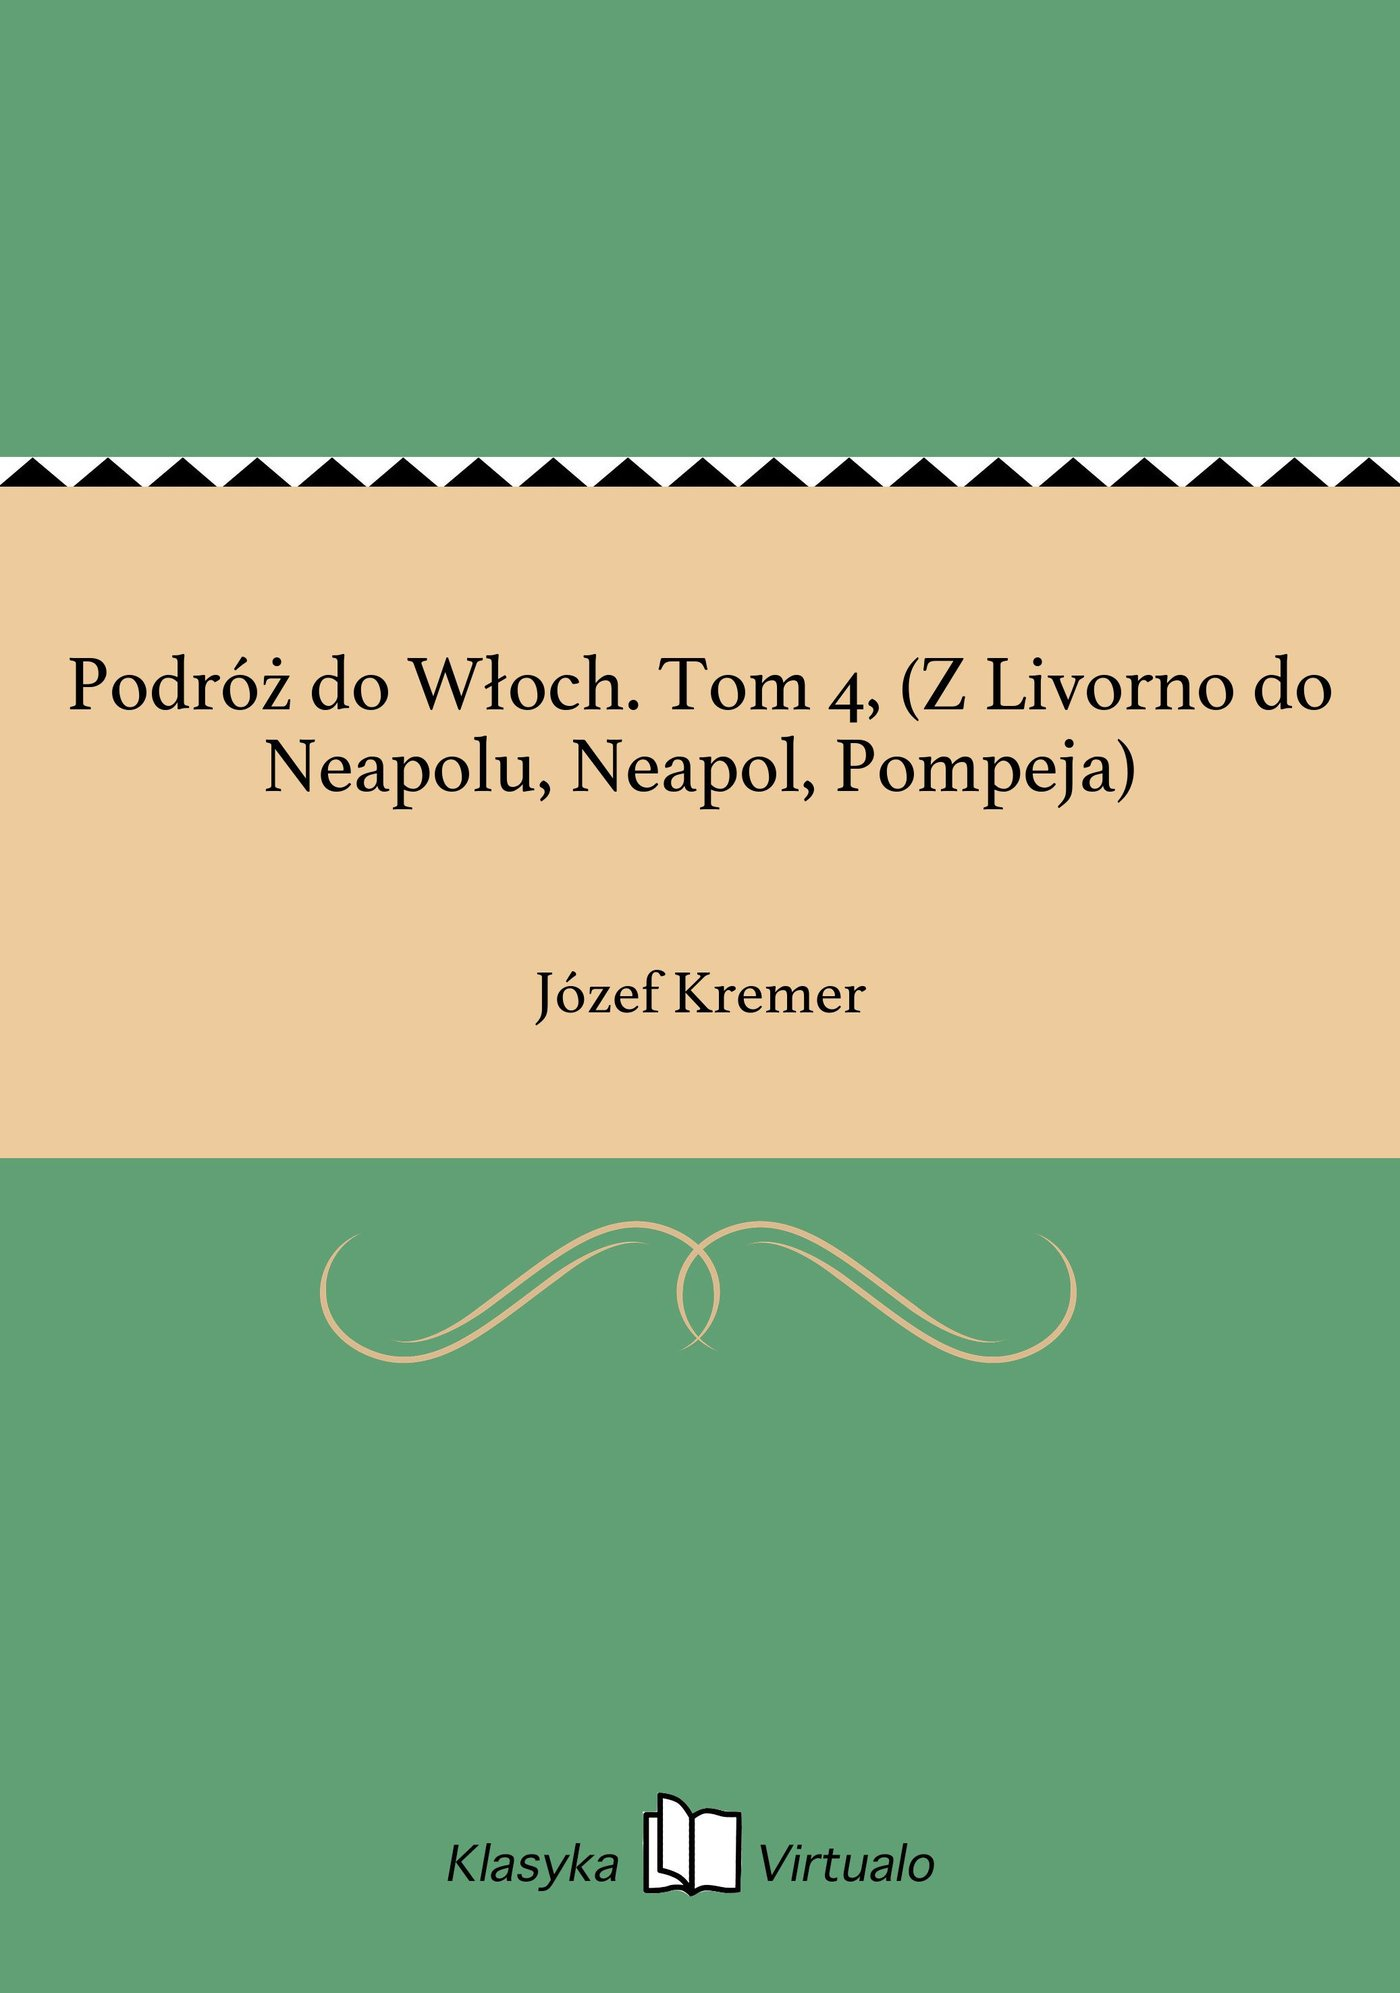 Podróż do Włoch. Tom 4, (Z Livorno do Neapolu, Neapol, Pompeja) - Ebook (Książka EPUB) do pobrania w formacie EPUB